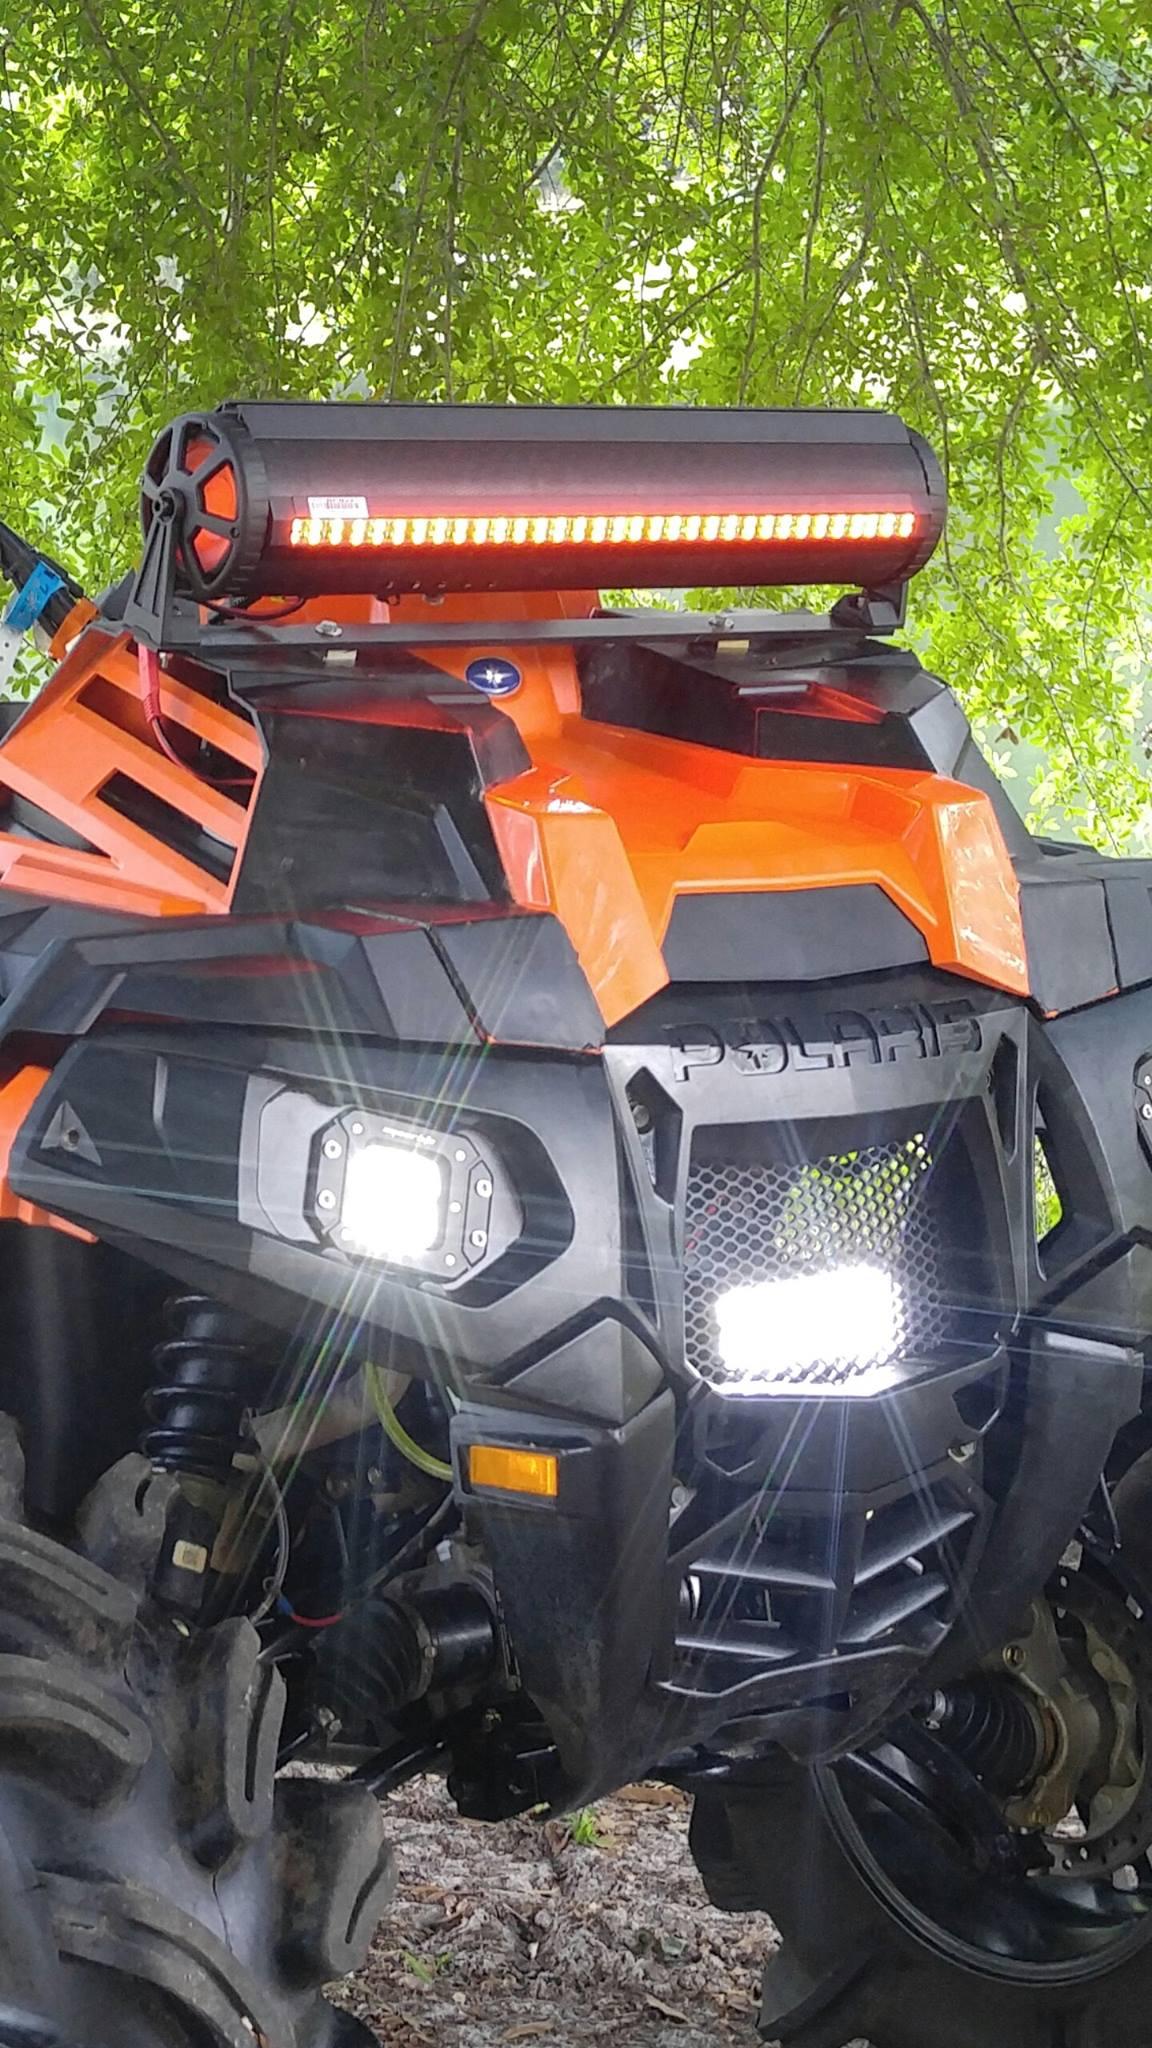 Hays Fabrication Led Lights For Sportsman Rzr Polaris